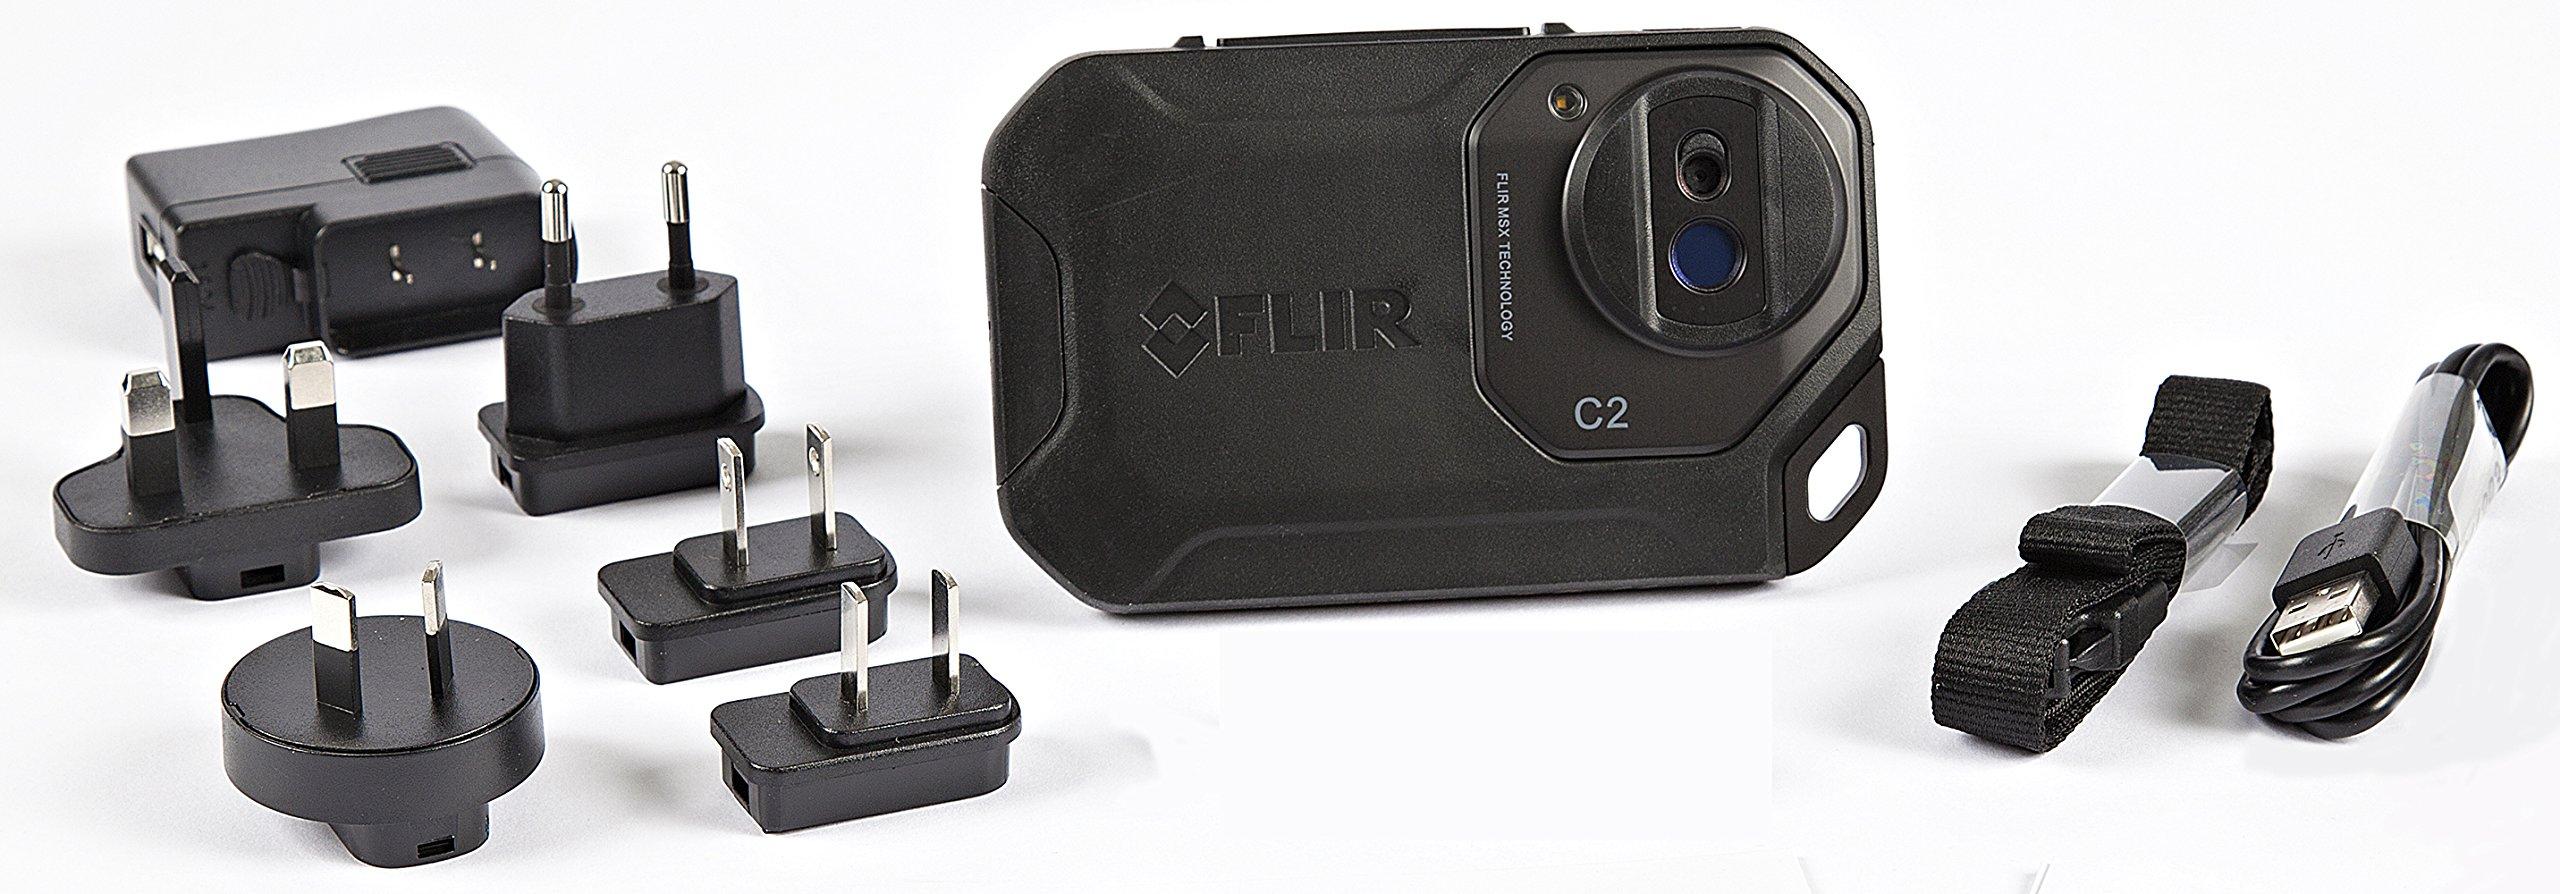 FLIR C2 Compact Thermal Imaging System by FLIR (Image #6)